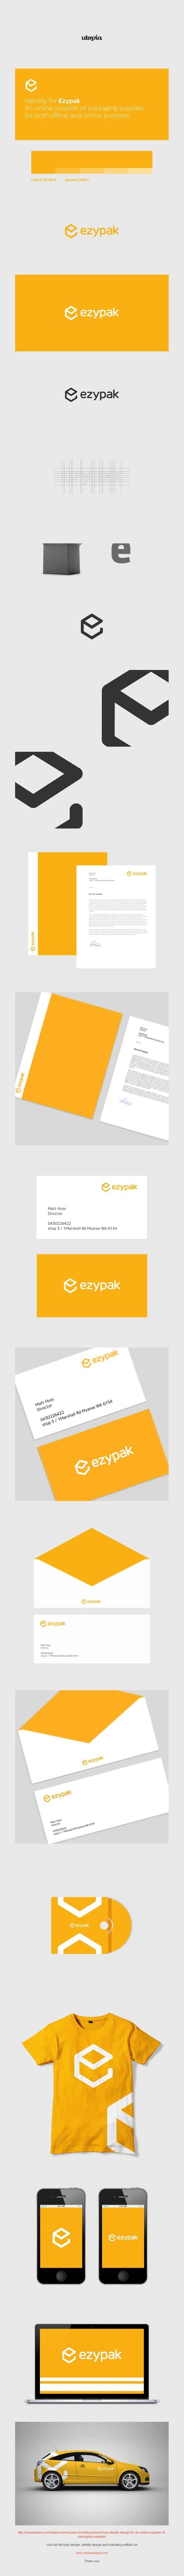 Ezypak logo and corporate identity design by Utopia Branding Agency